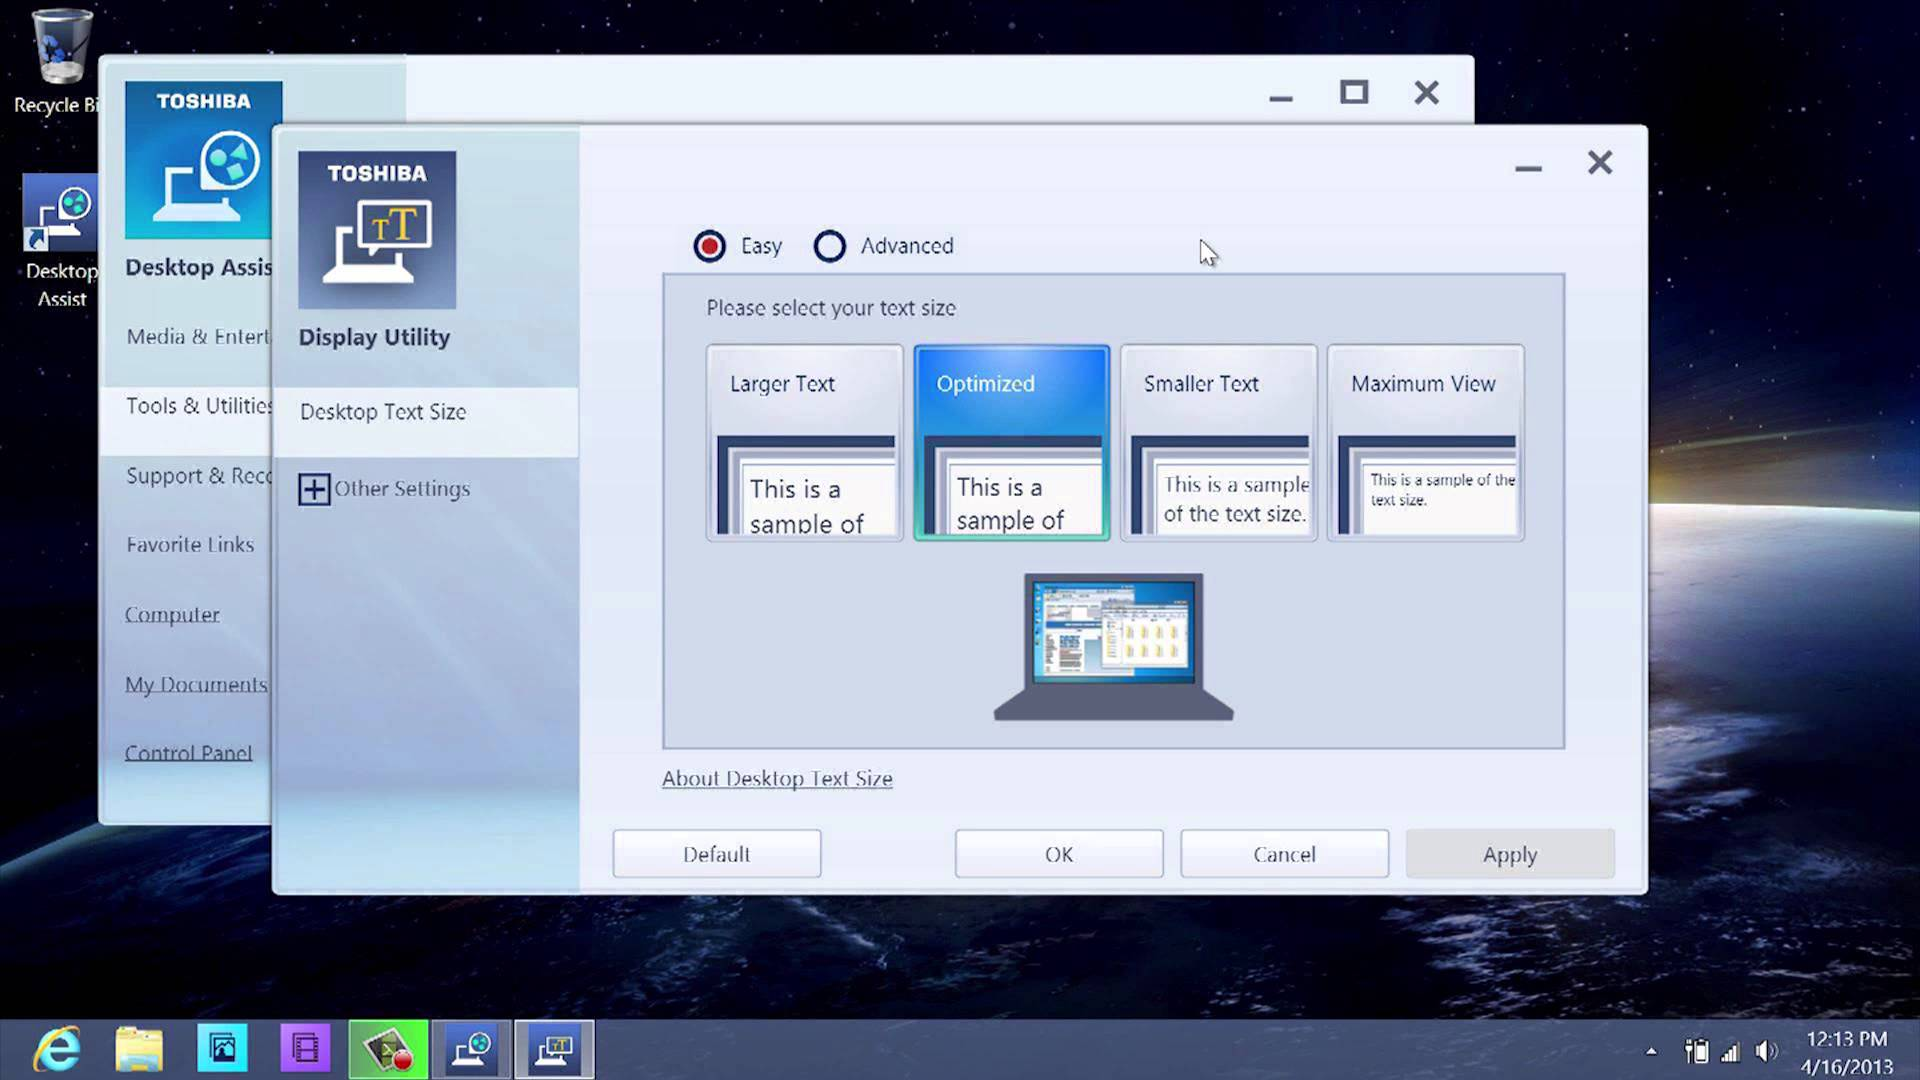 Toshiba Display Utility blocking Windows 10 Creators Update